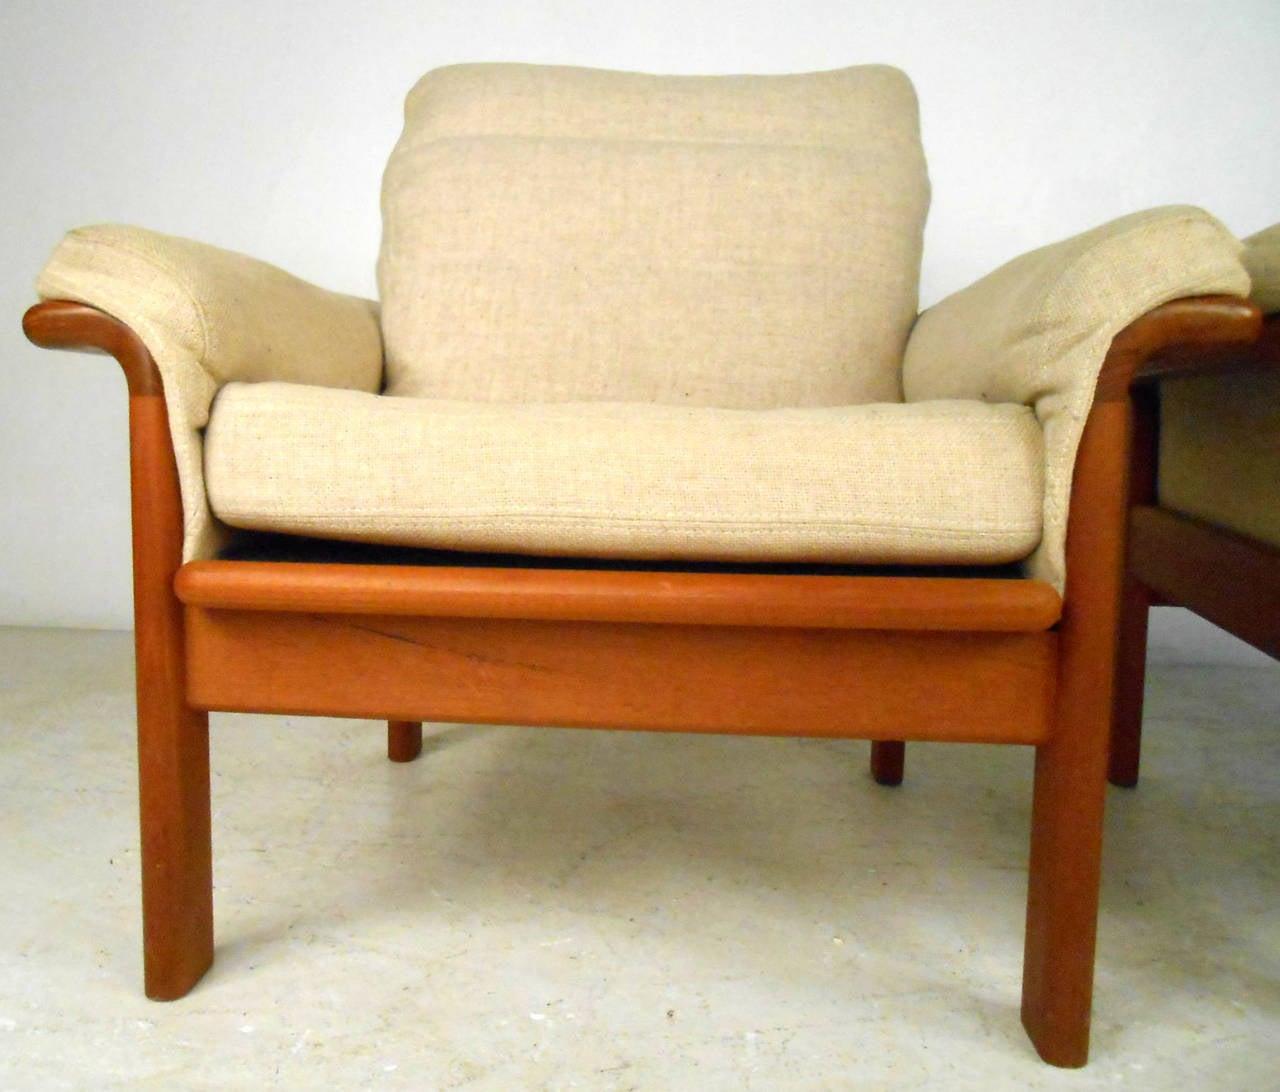 pair beautiful mid century modern danish teak armchairs 6 beautiful mid century modern danish style teak